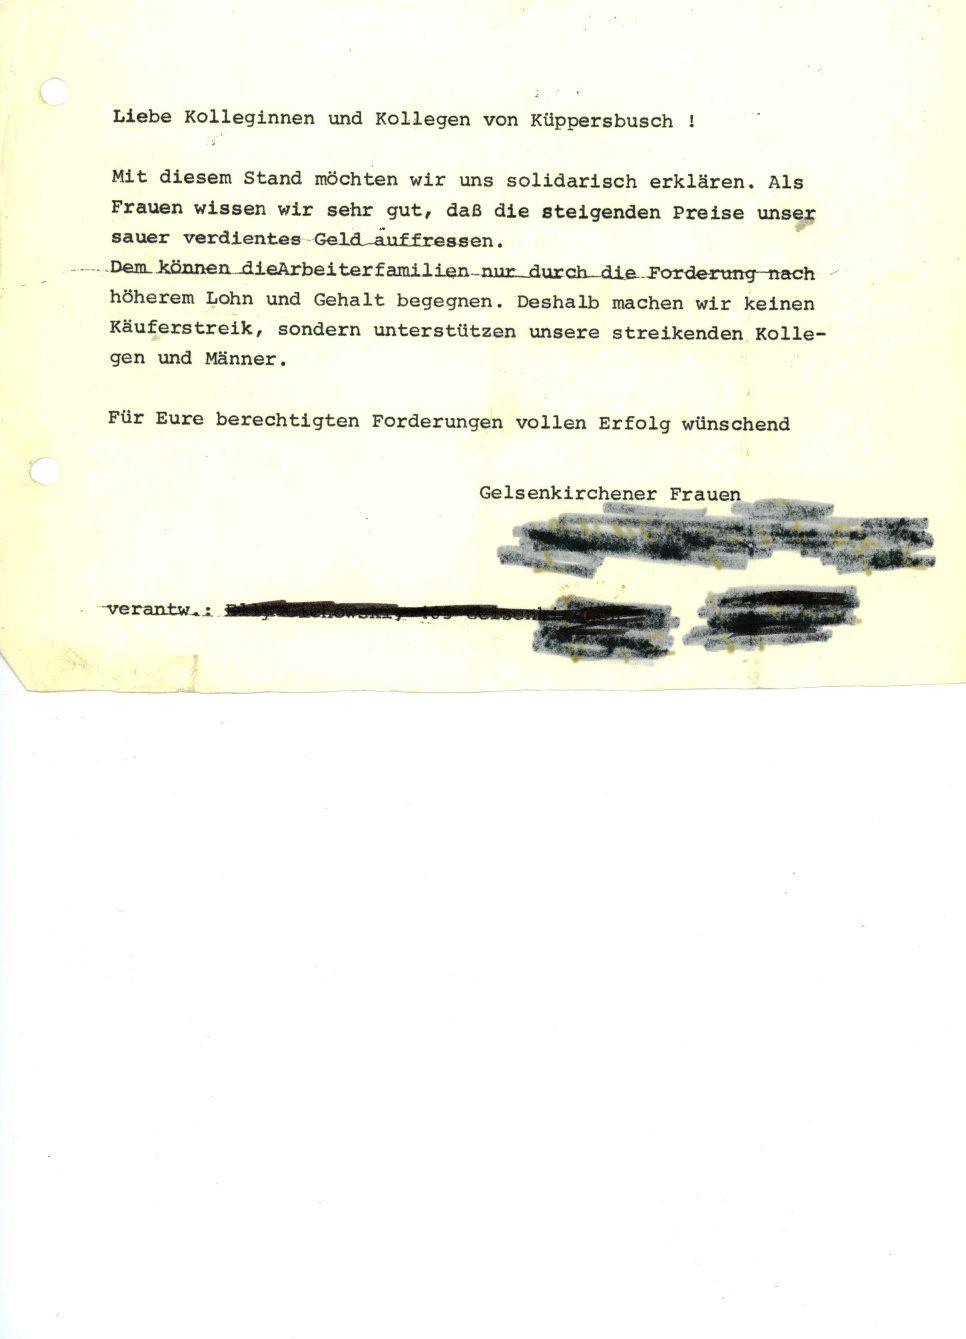 Frauen_1973_01